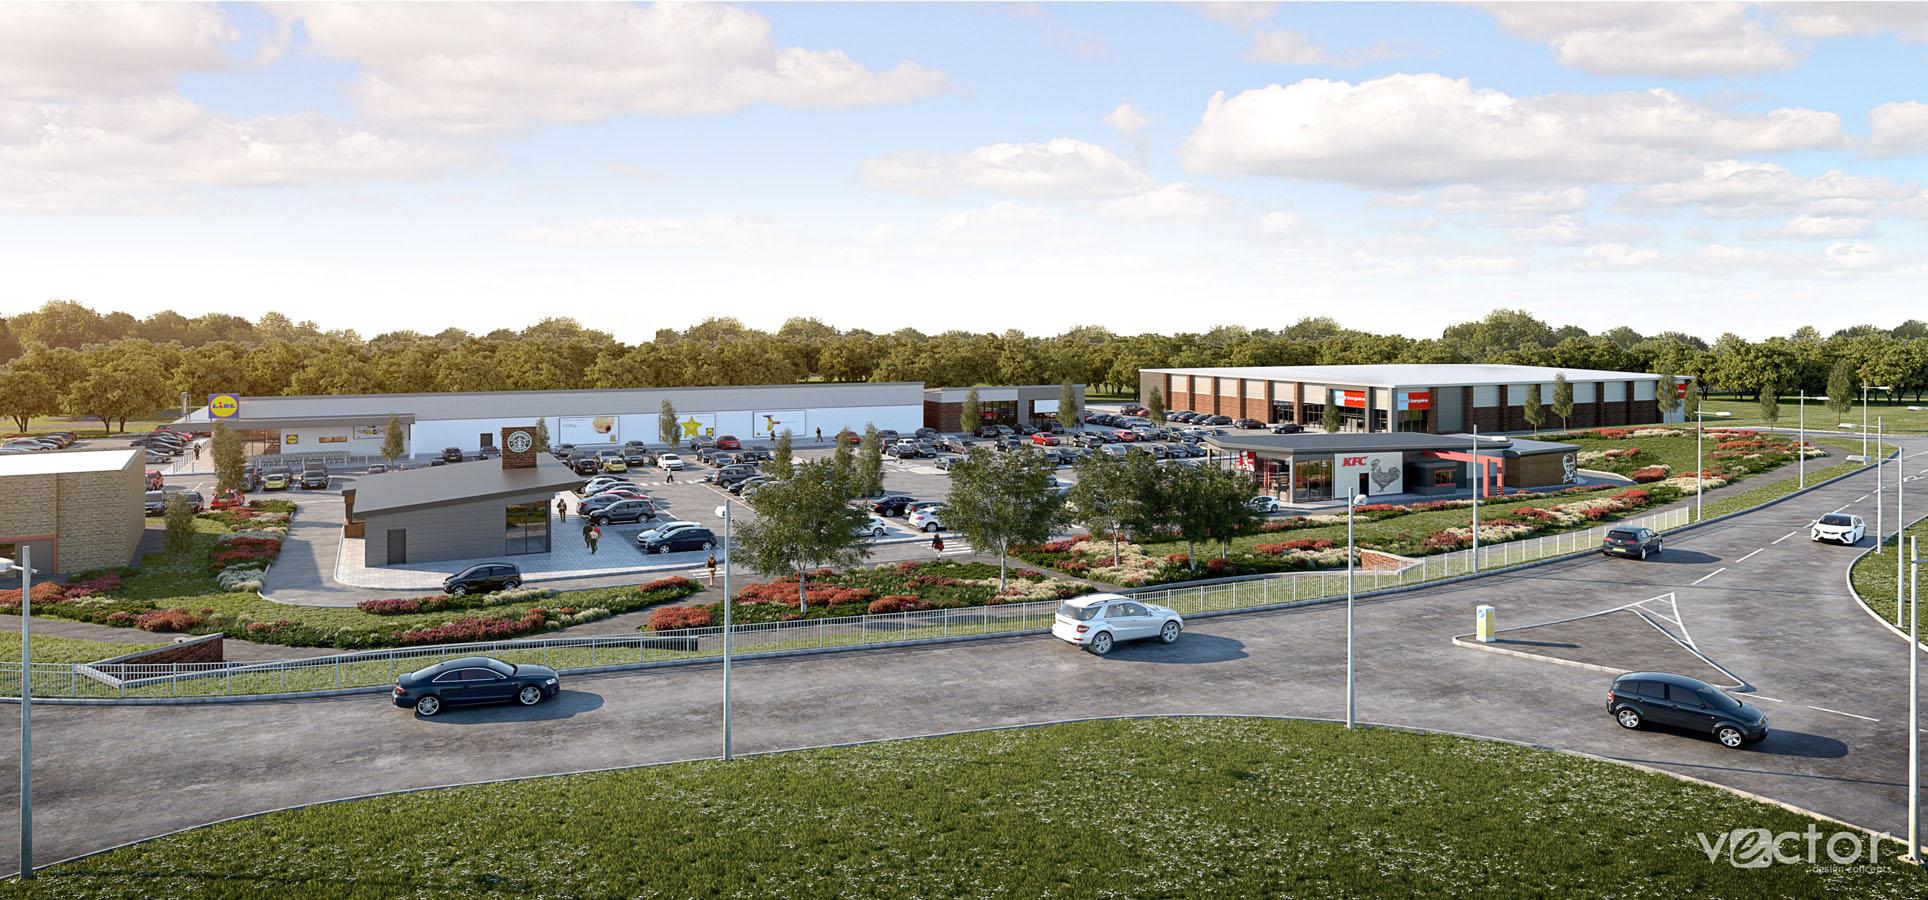 Work Starts on Retail Development in Peterlee, Jessops Construction Ltd